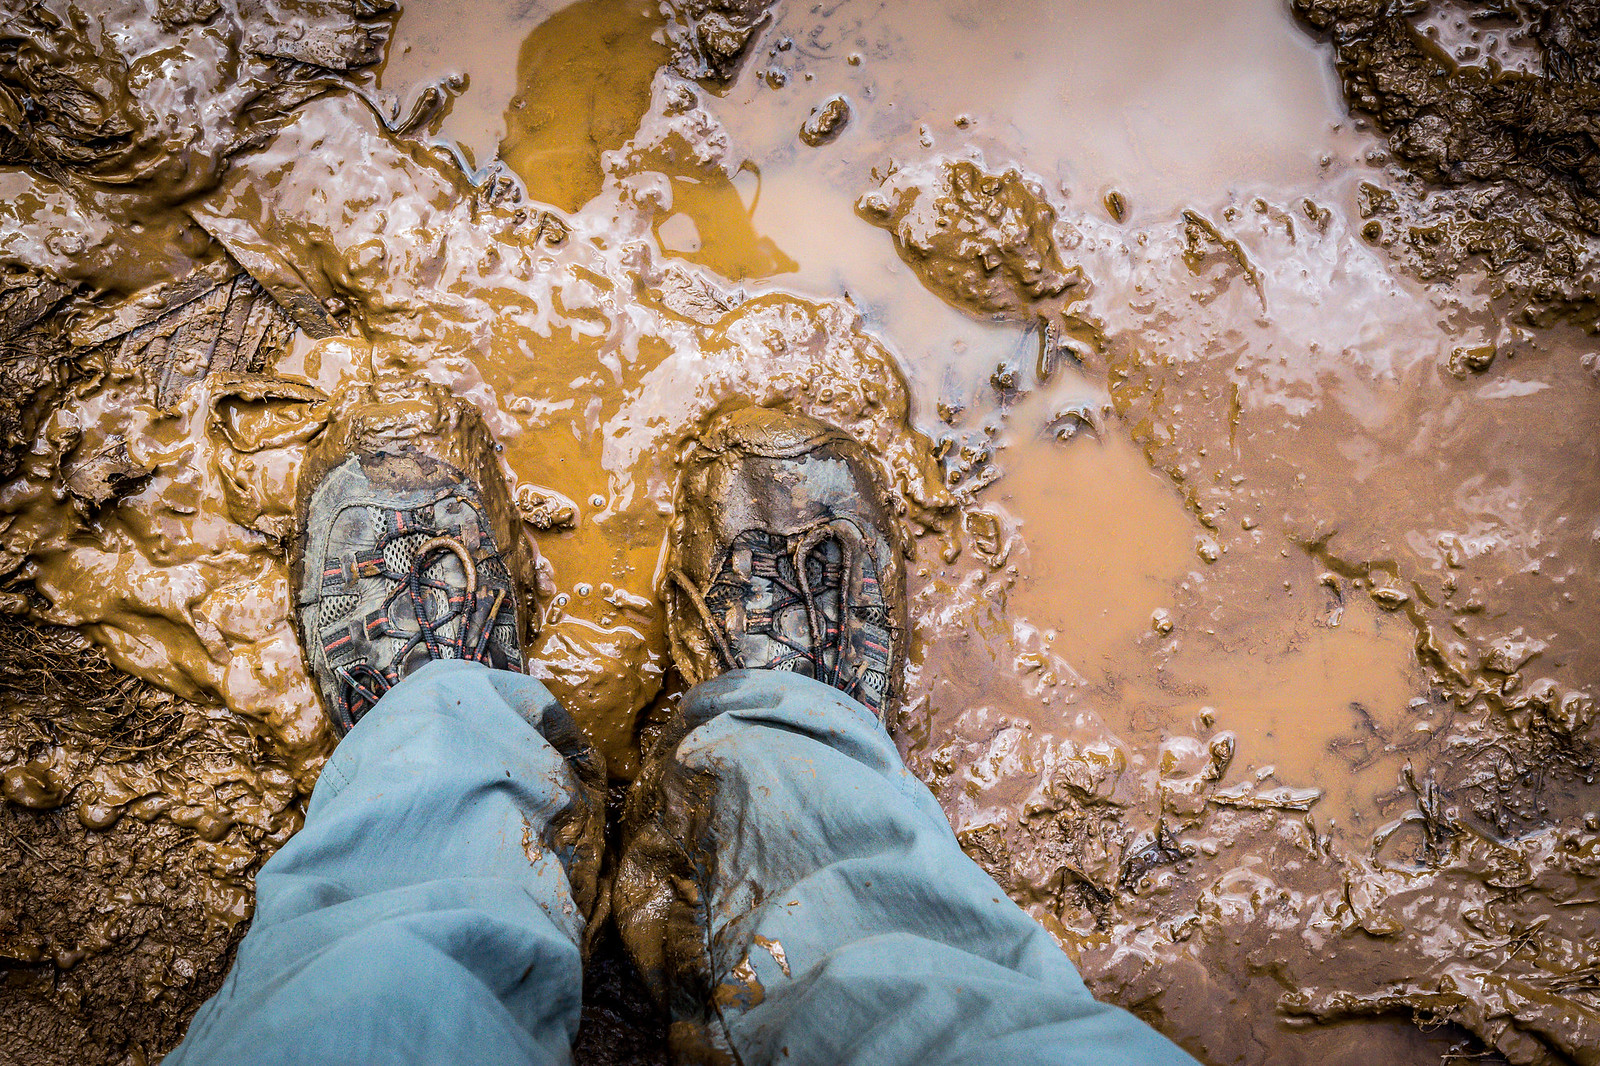 oh yeah, it's pretty muddy too